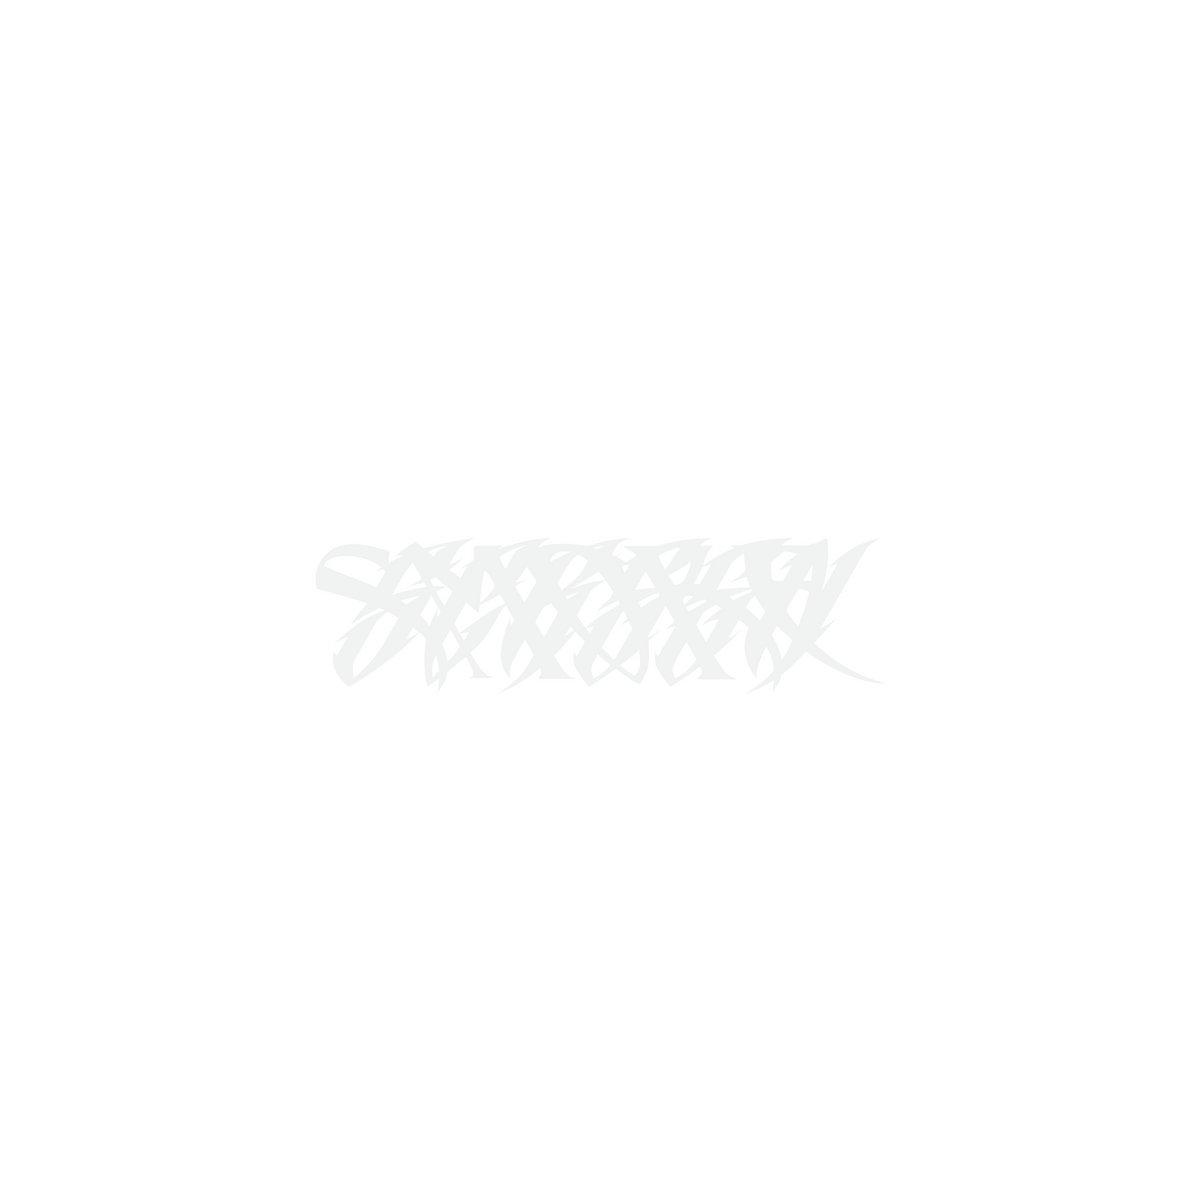 George Chua - Smokescreen